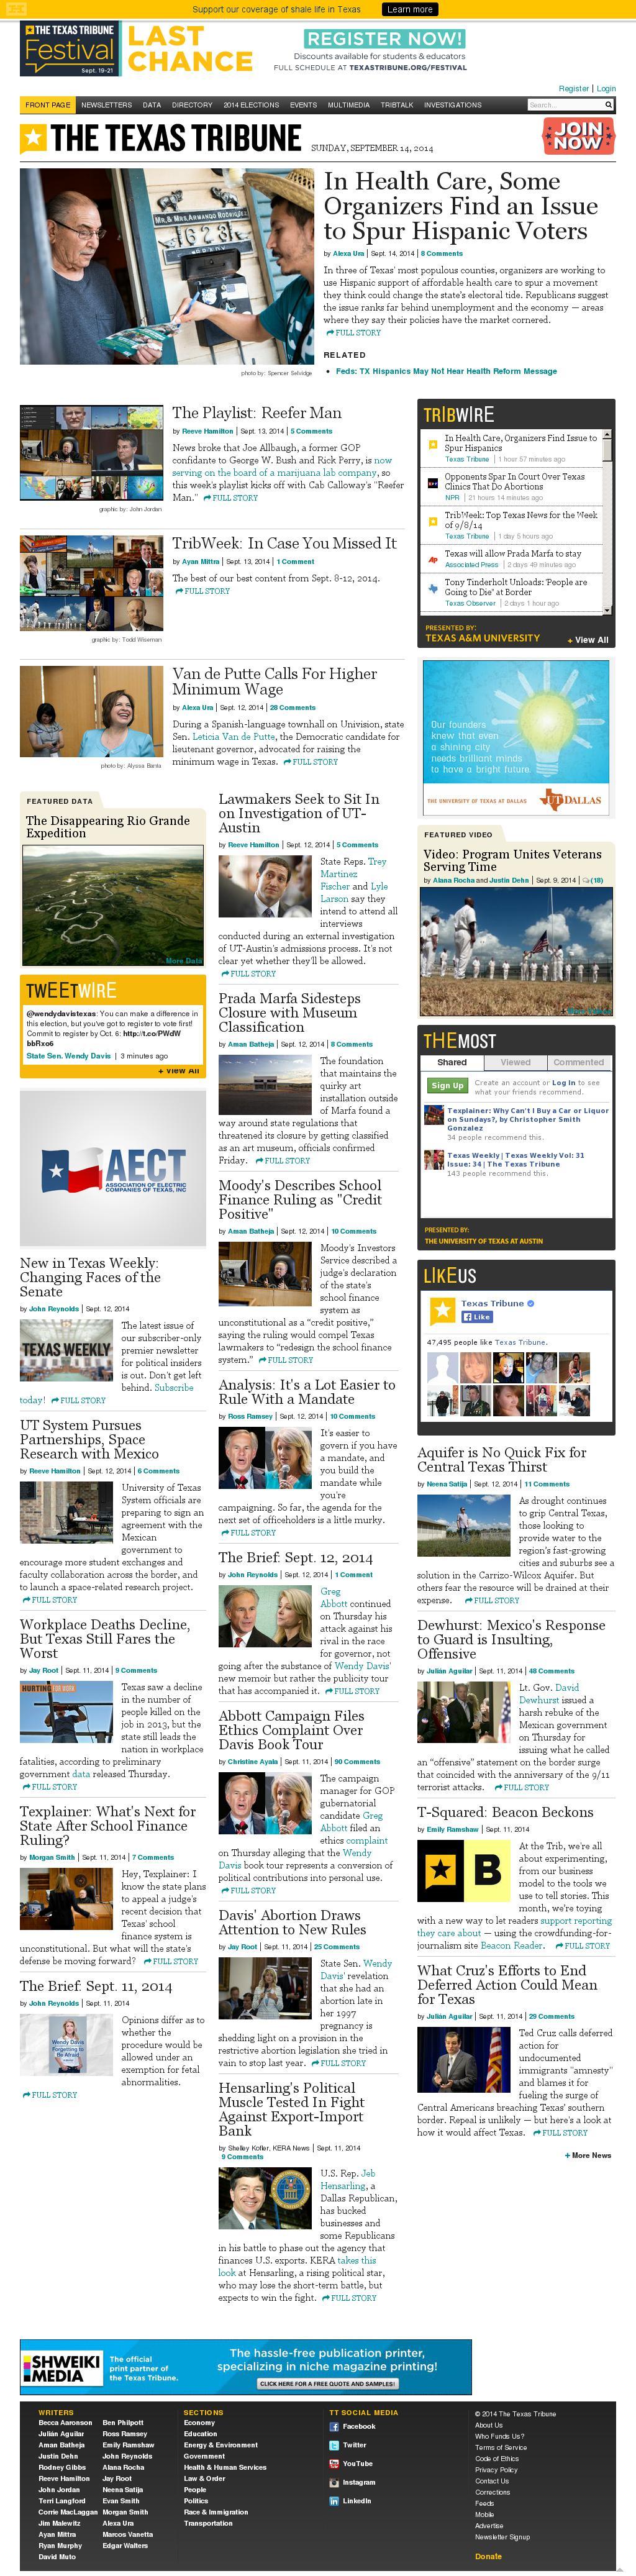 The Texas Tribune at Sunday Sept. 14, 2014, 8:18 p.m. UTC